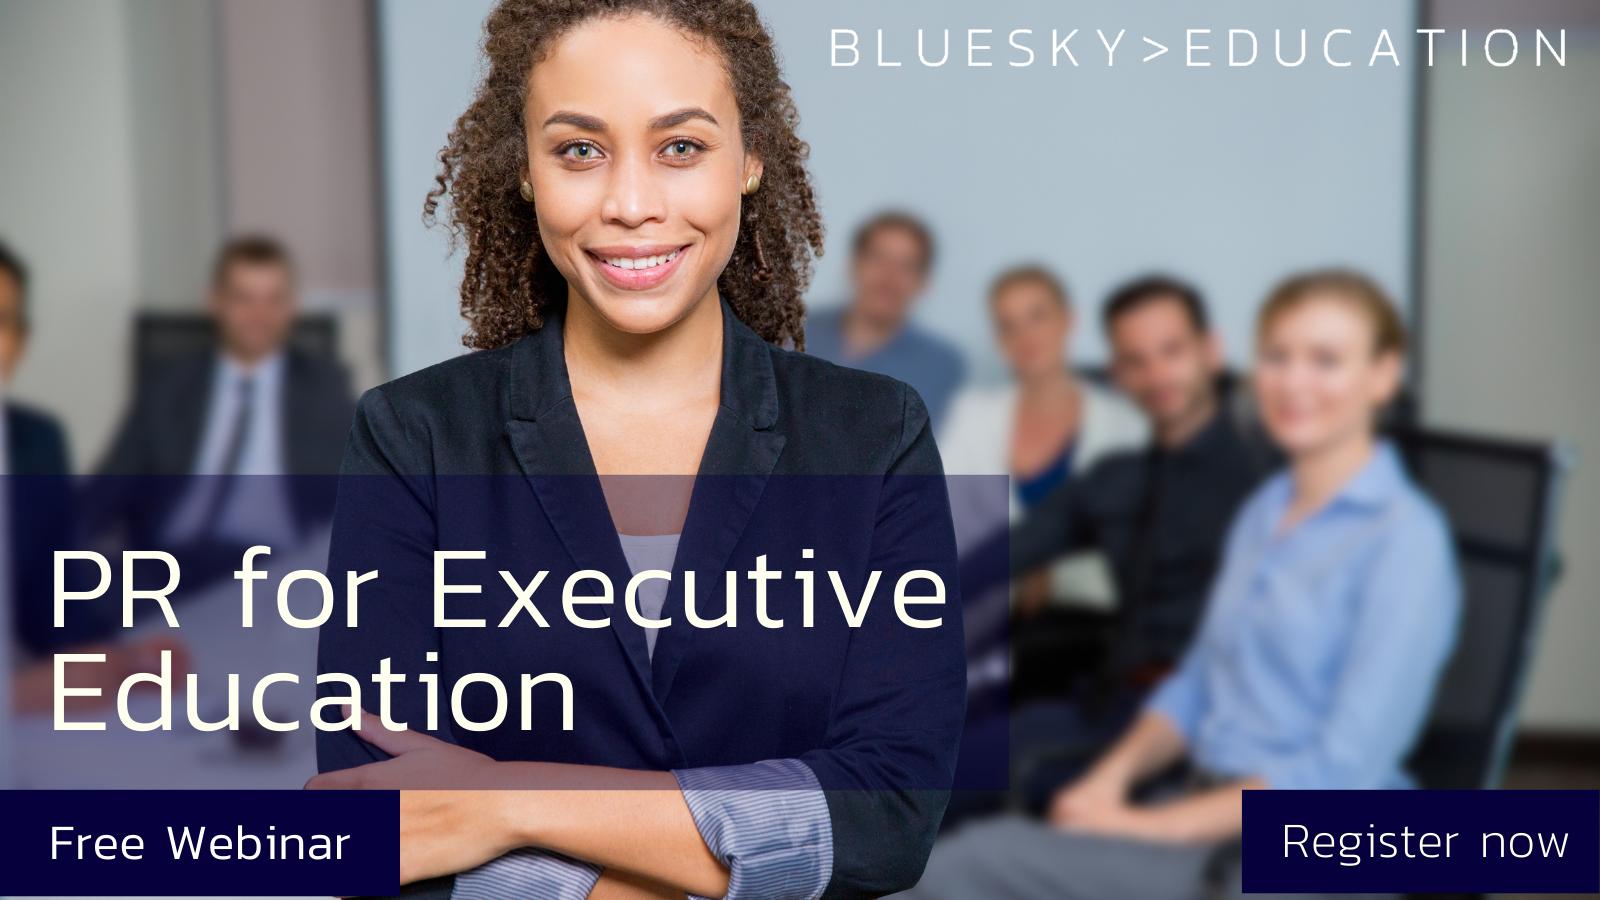 PR for Executive Education